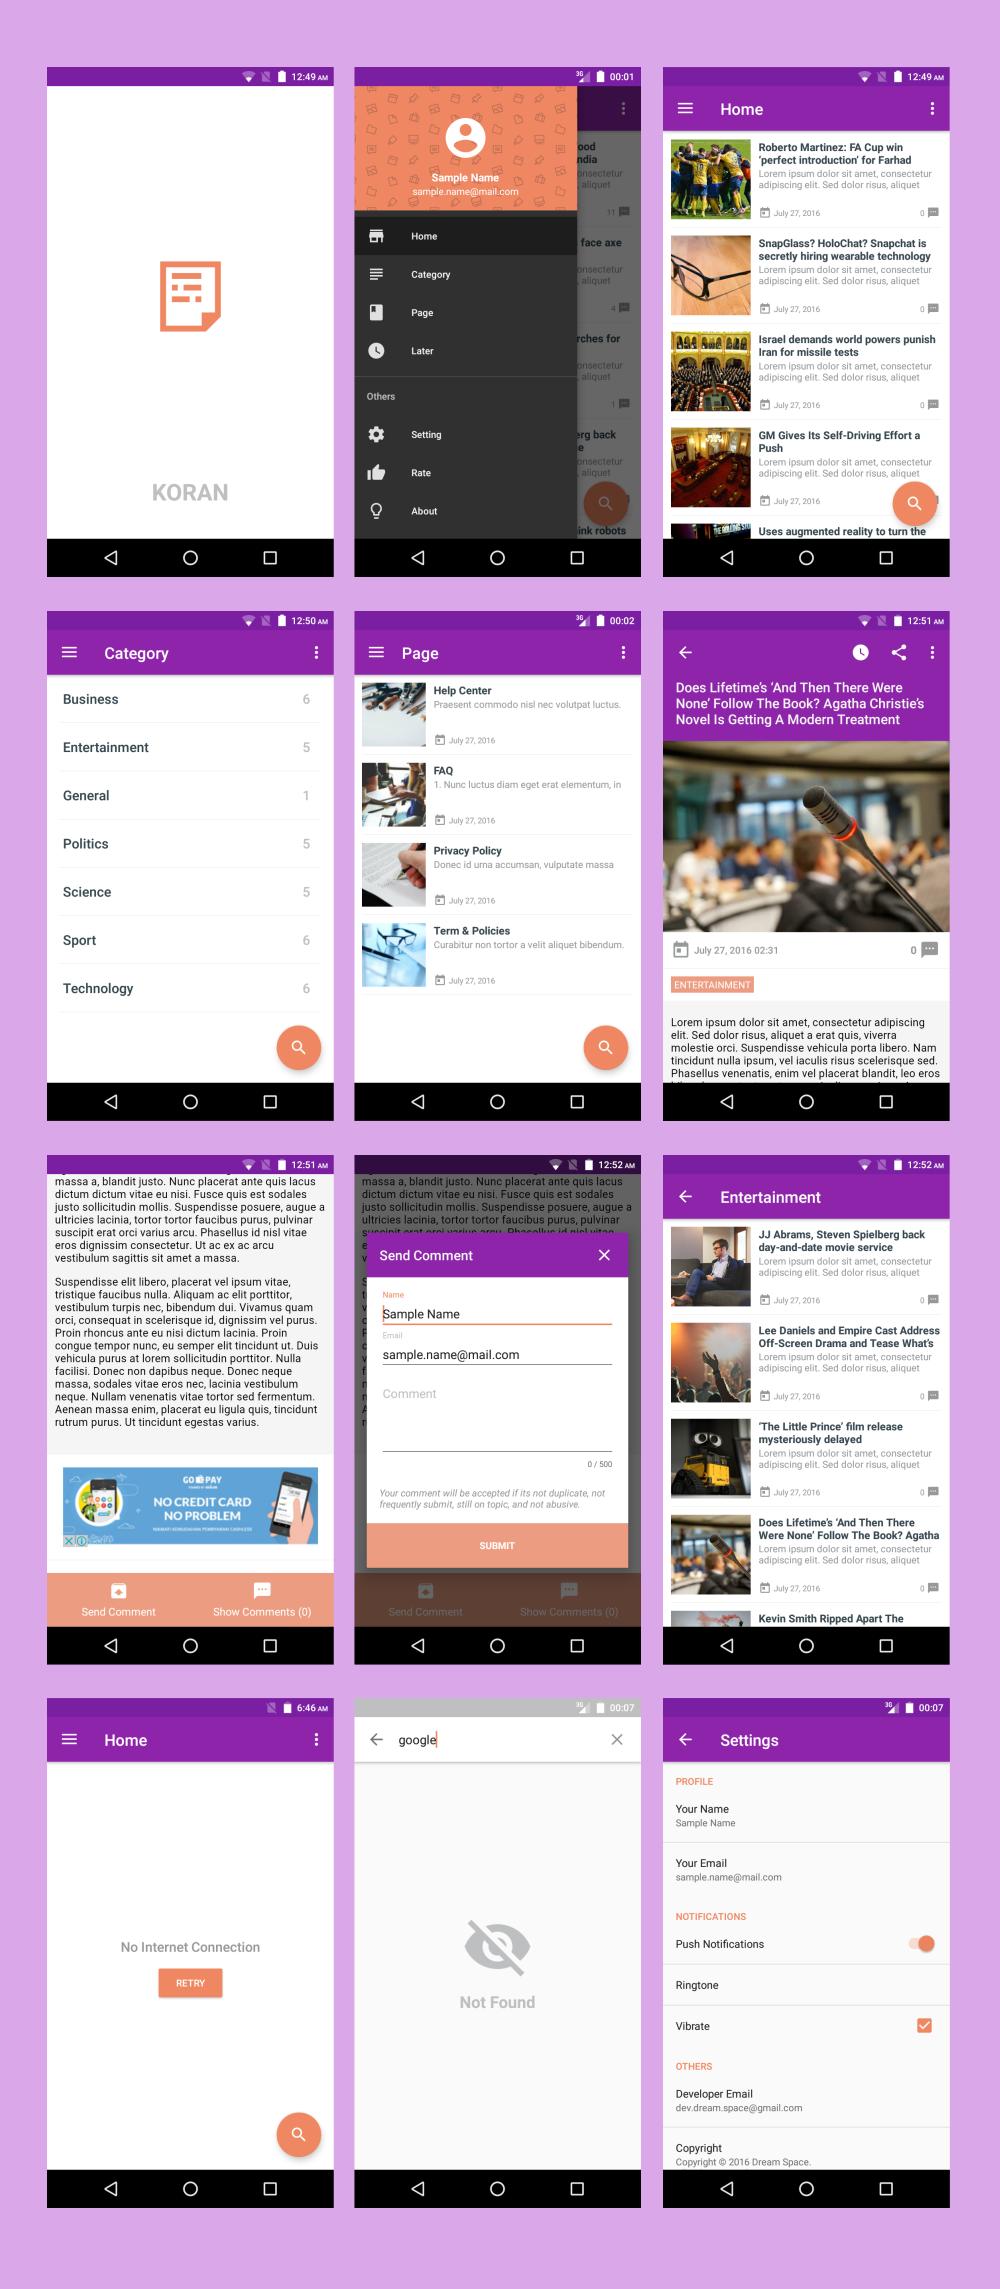 Koran - WordPress App with Push Notification 3.6 - 1